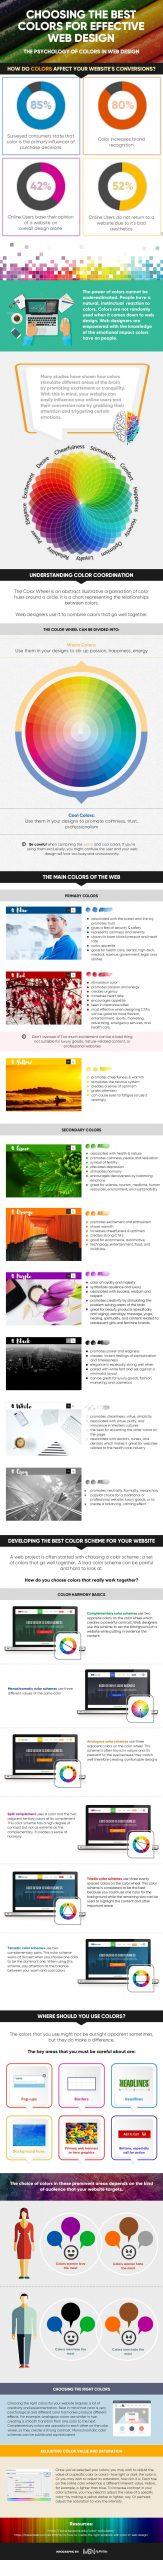 The Psychology of Color on Website Design Infographic compressed